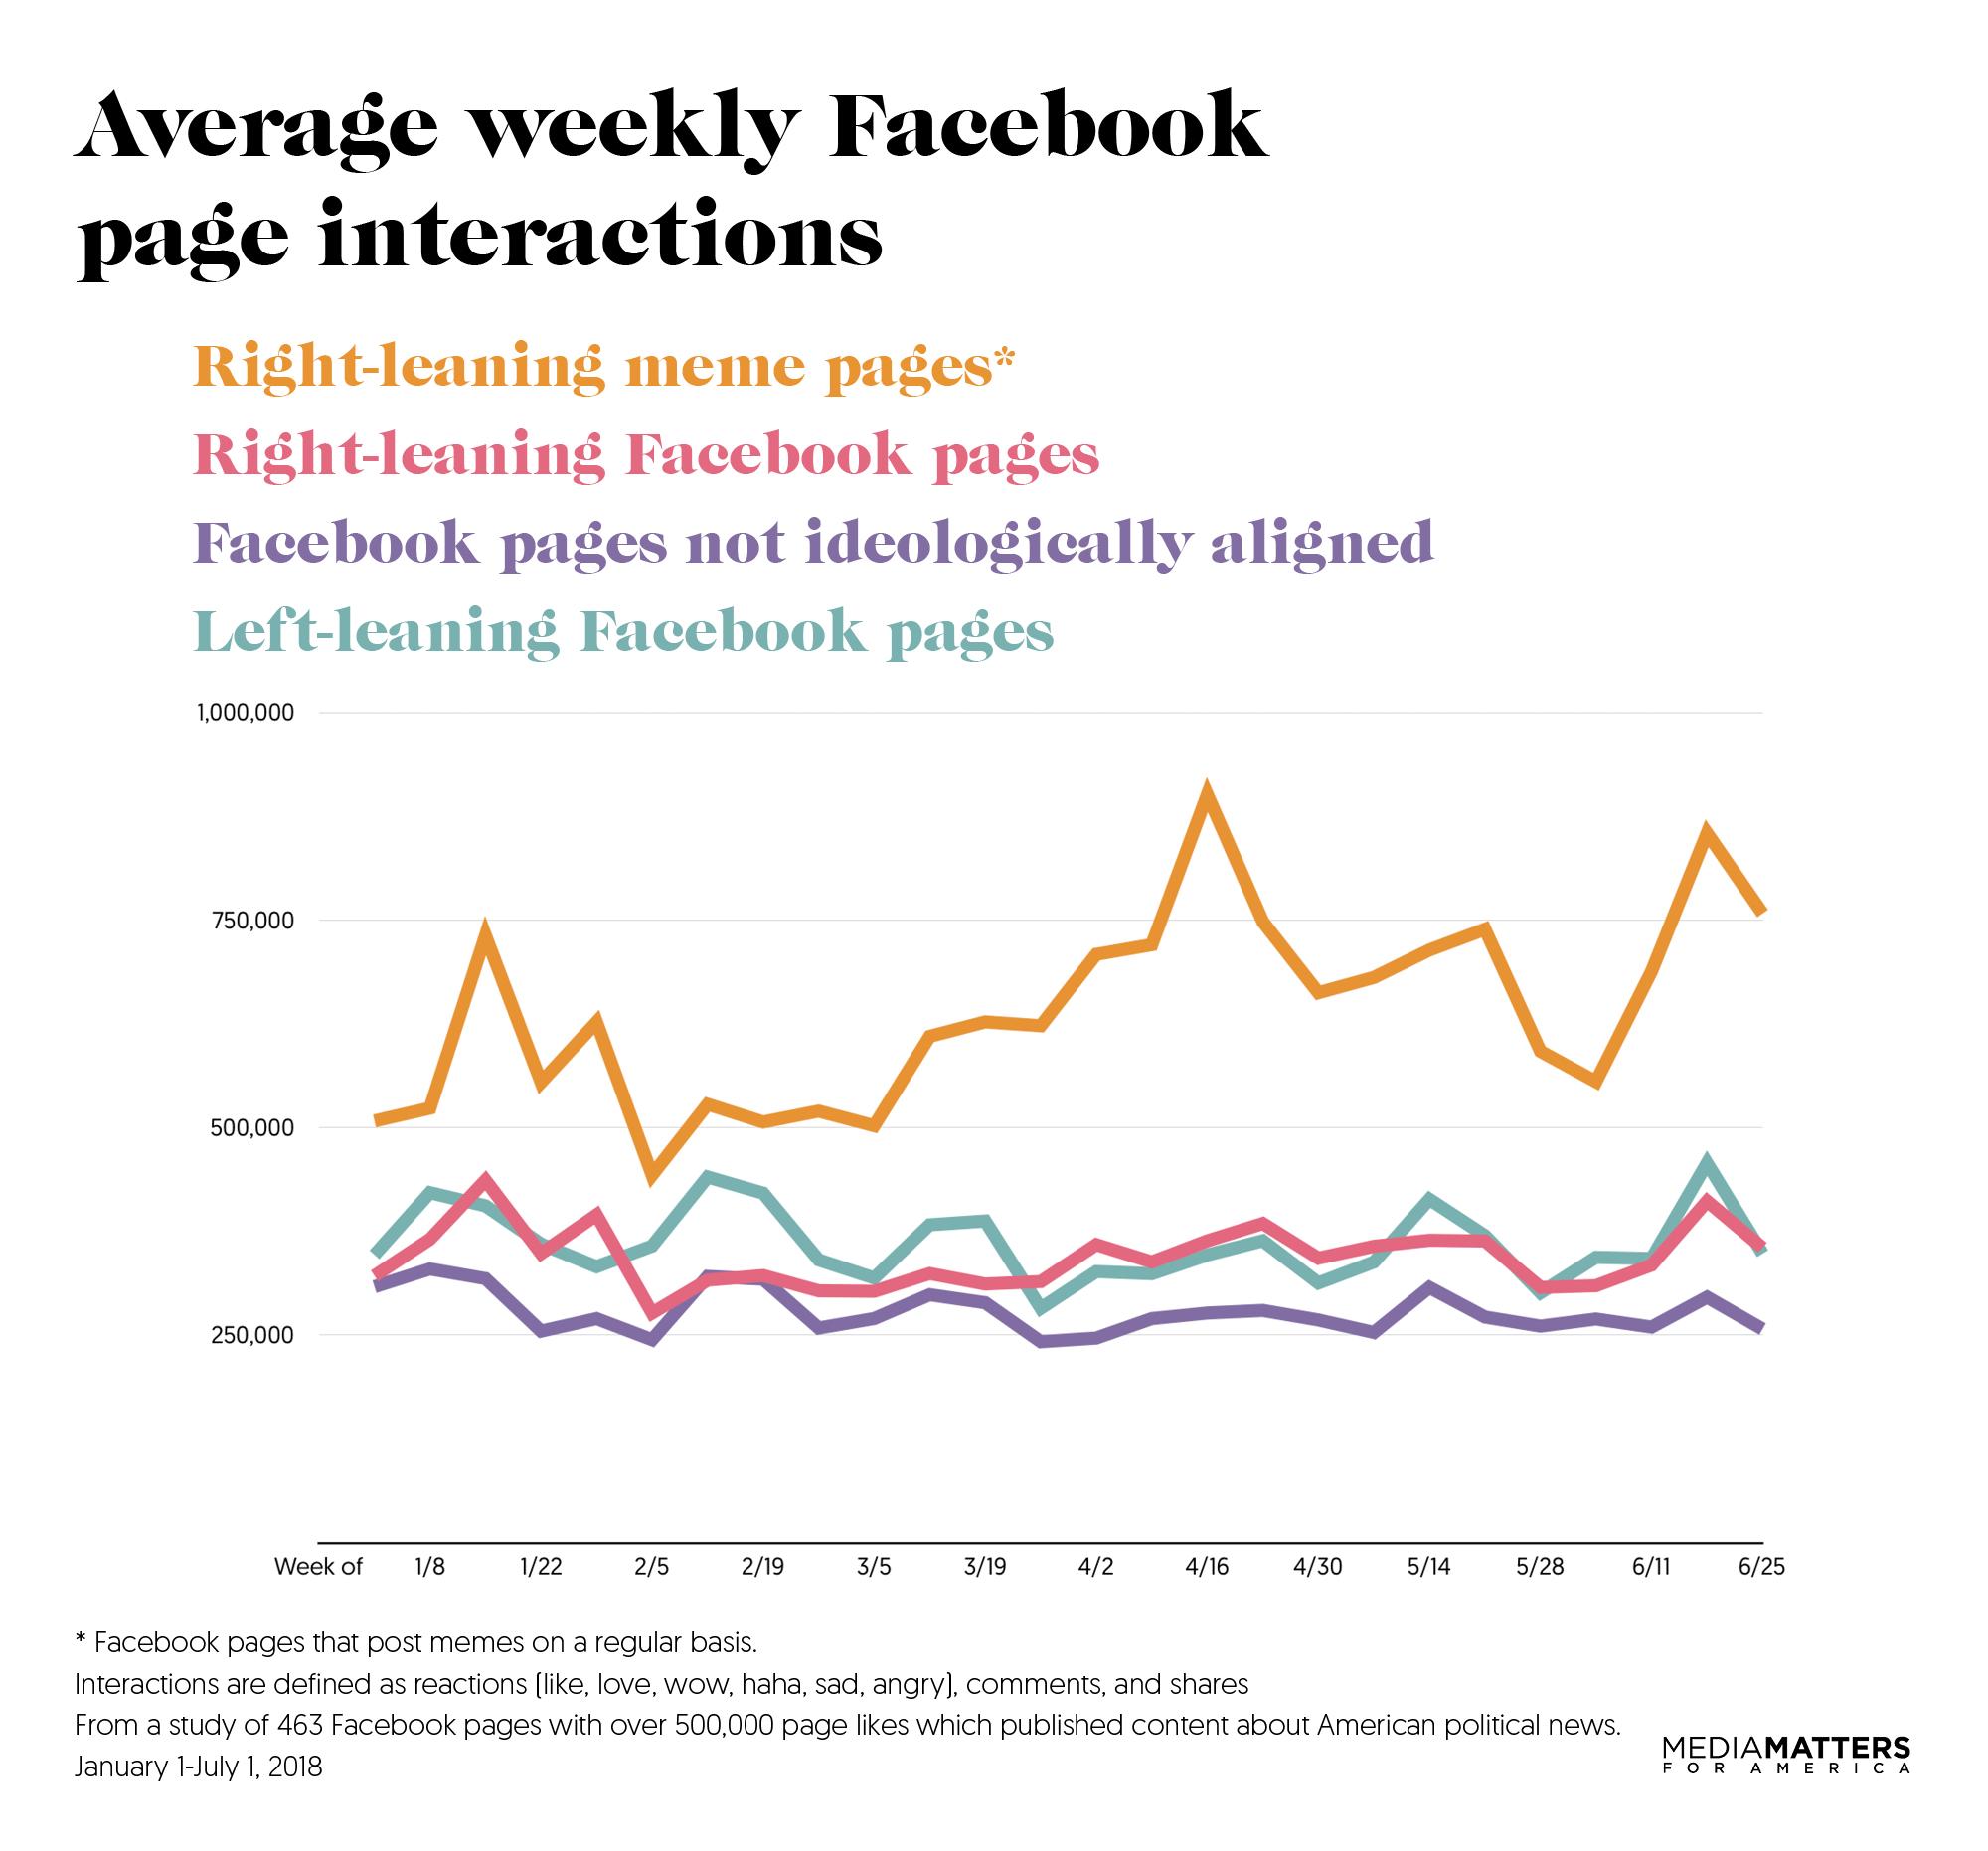 facebookinteractions-mediamatters-graph2